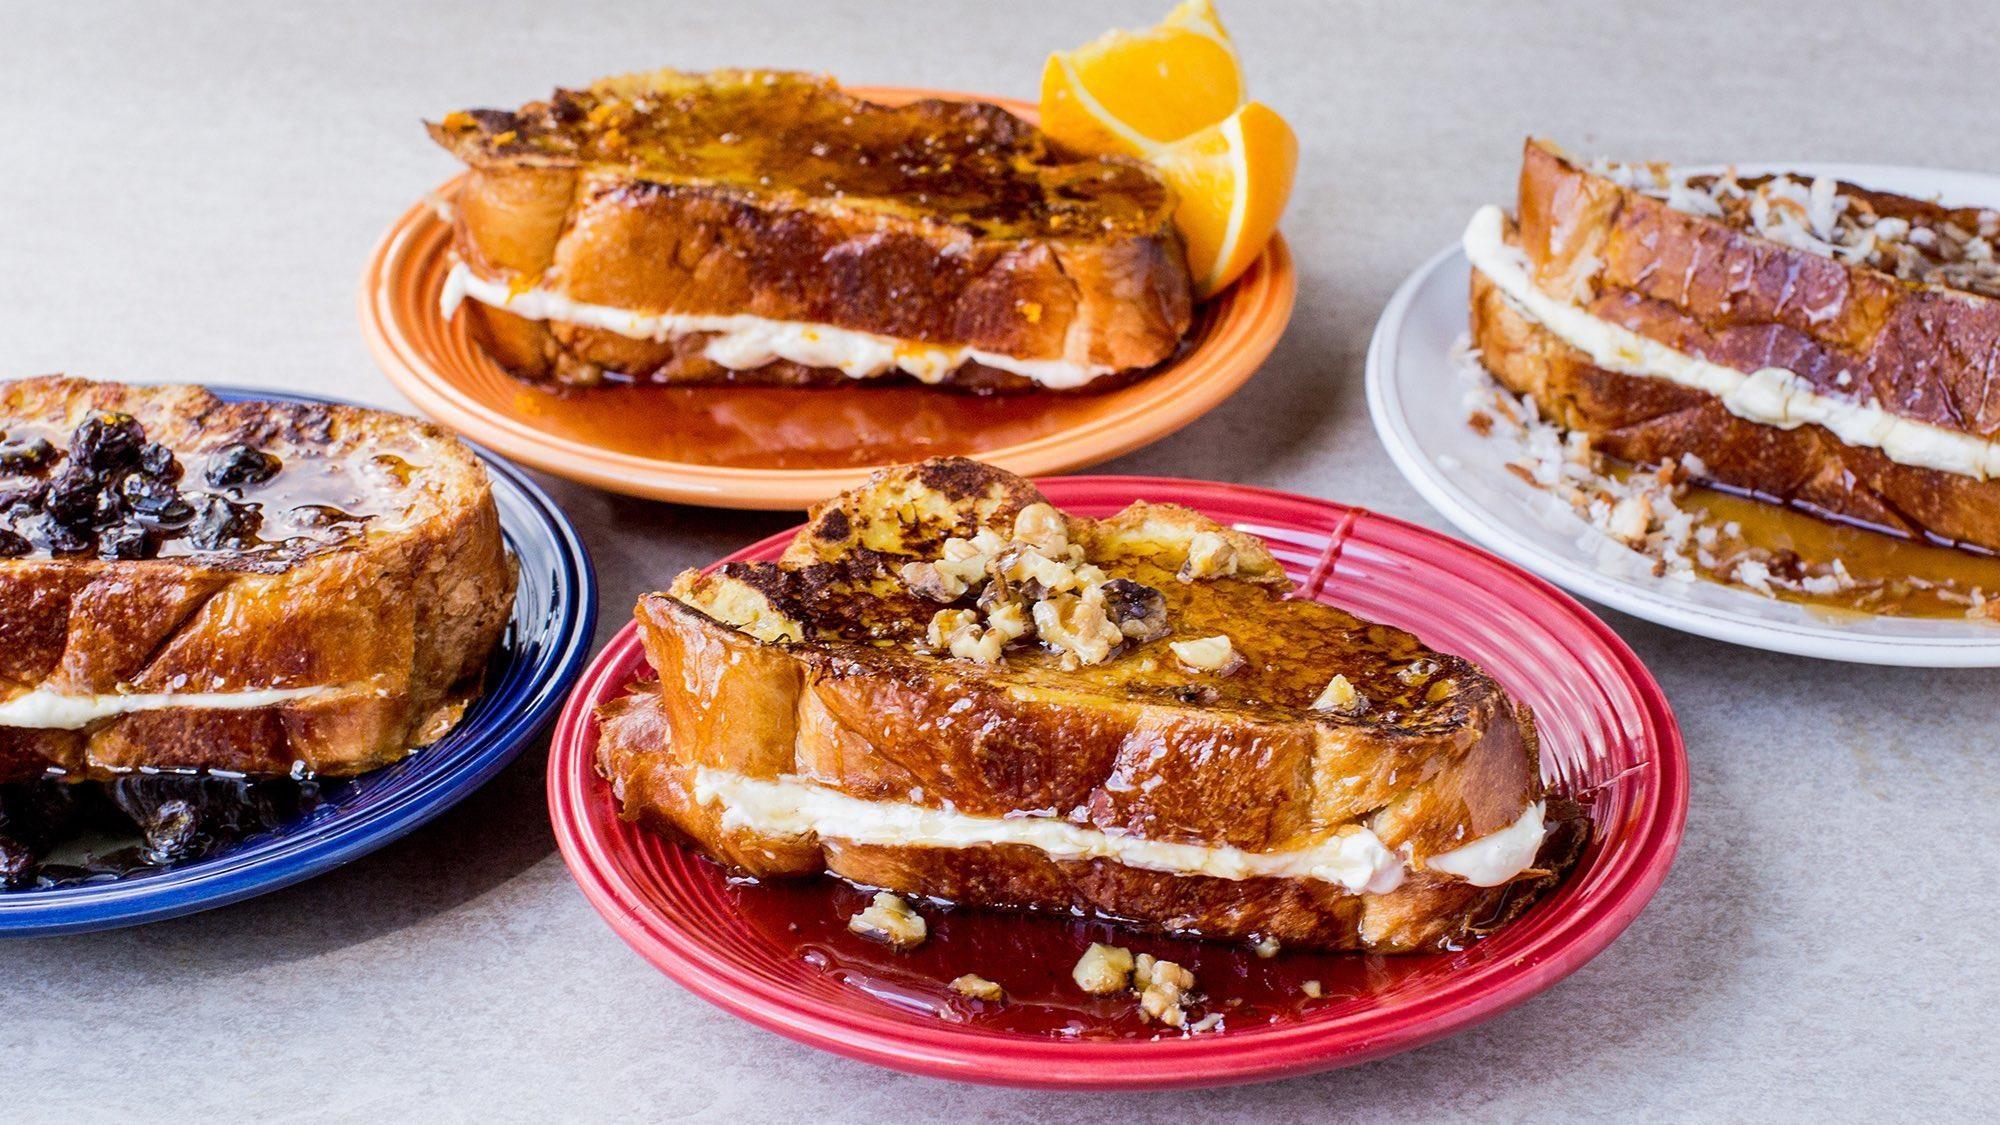 Creamy stuffed french toast recipe recipe french toast